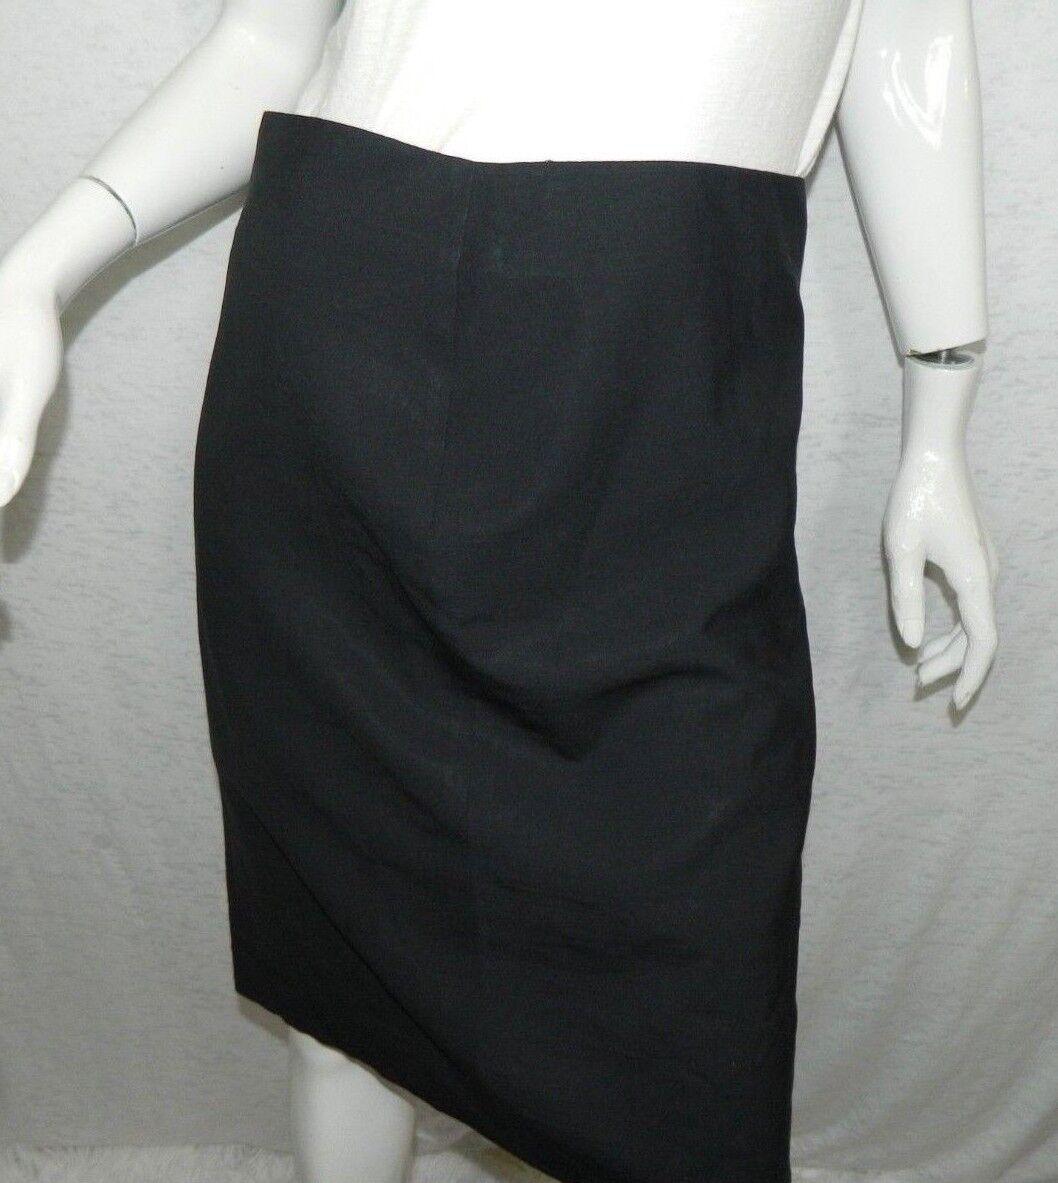 Fendi Skirts Navy bluee Pencil Skirt Size 40